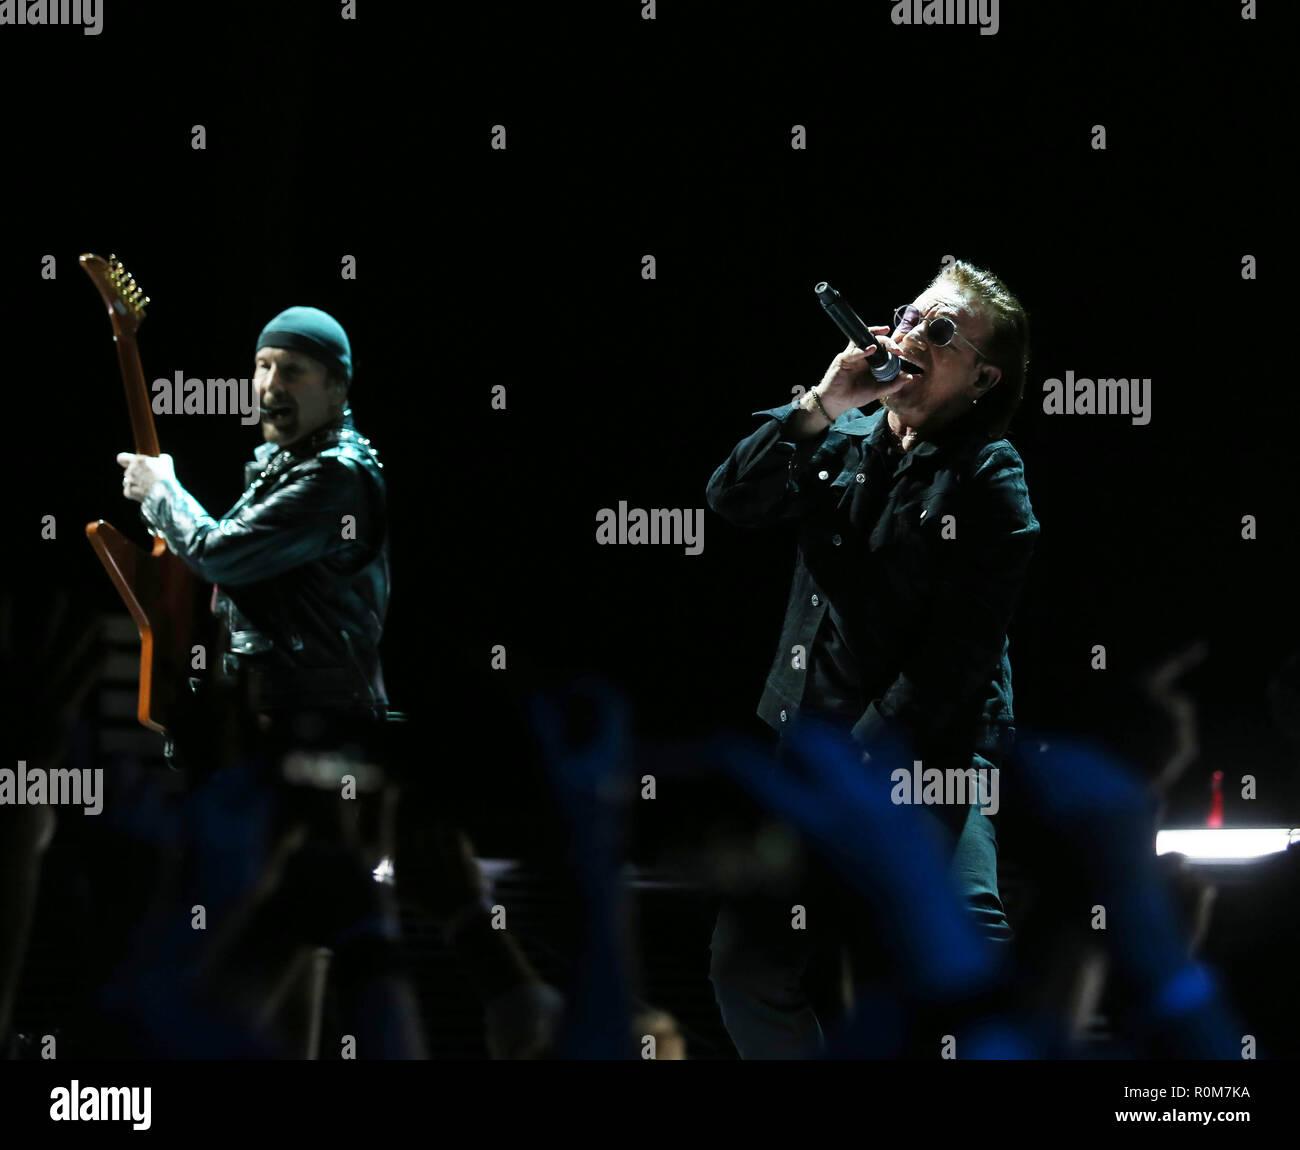 Bono U2 Live Stock Photos & Bono U2 Live Stock Images - Alamy